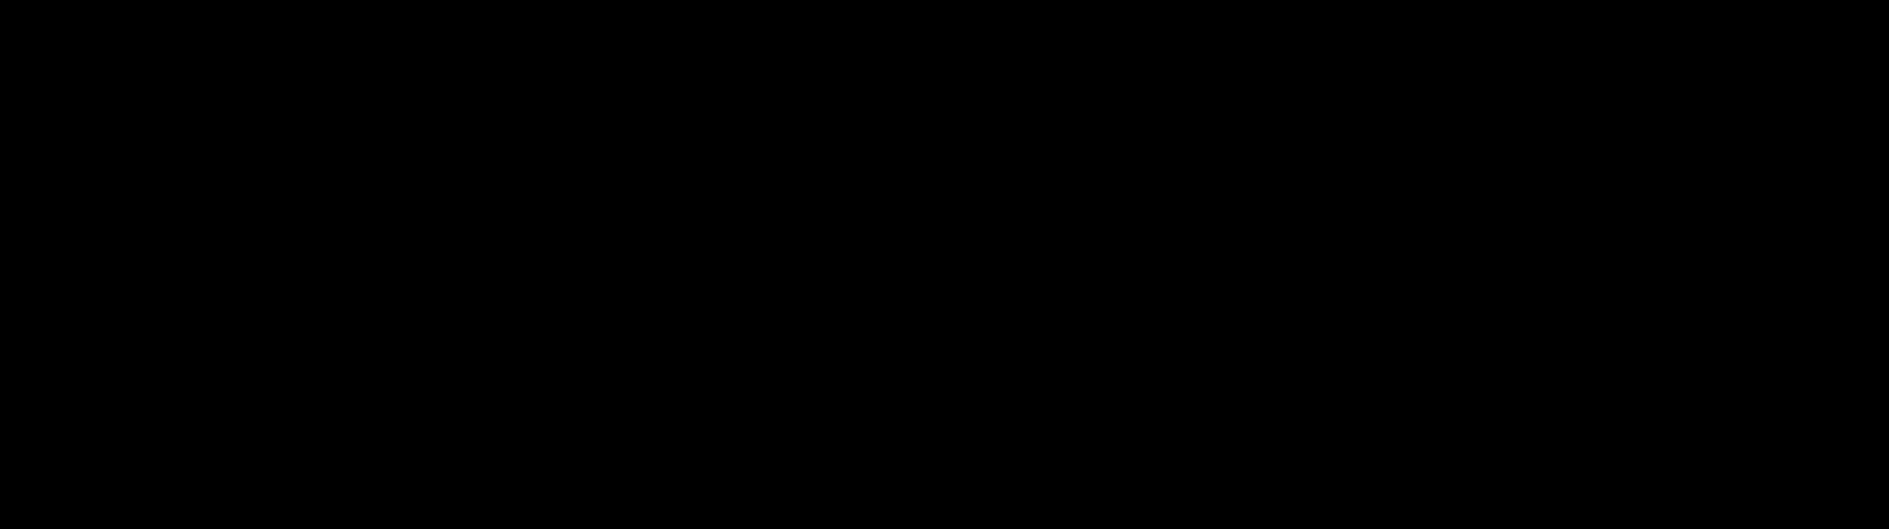 image27.png